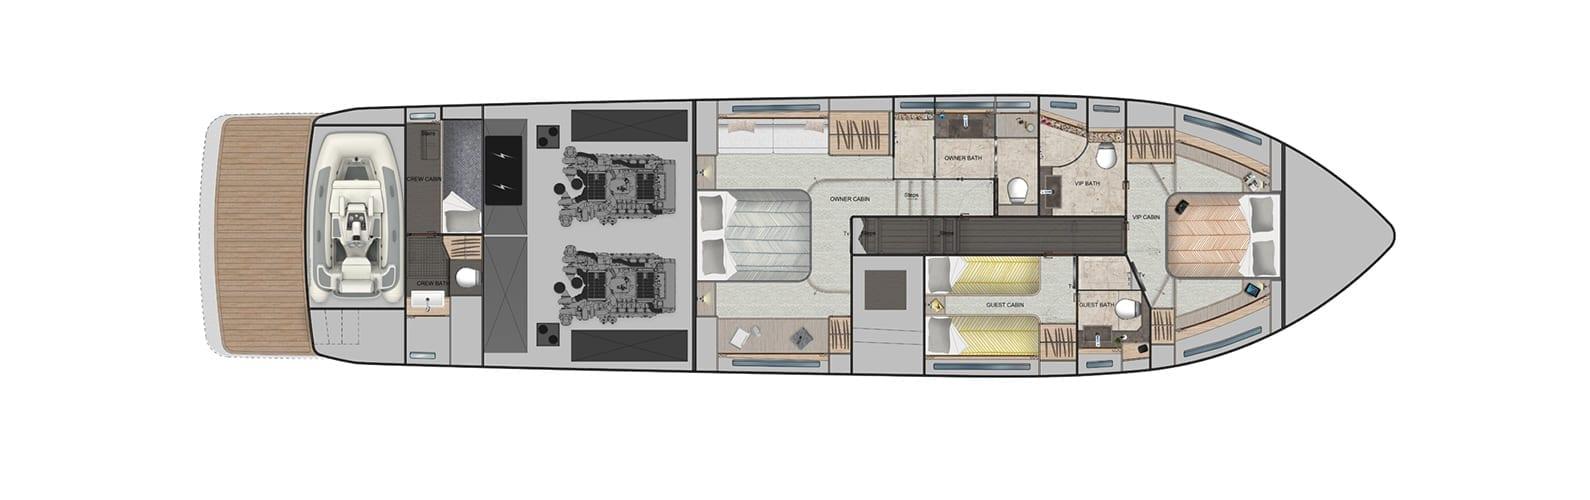 uniesse-ss-7-floor-plant-3